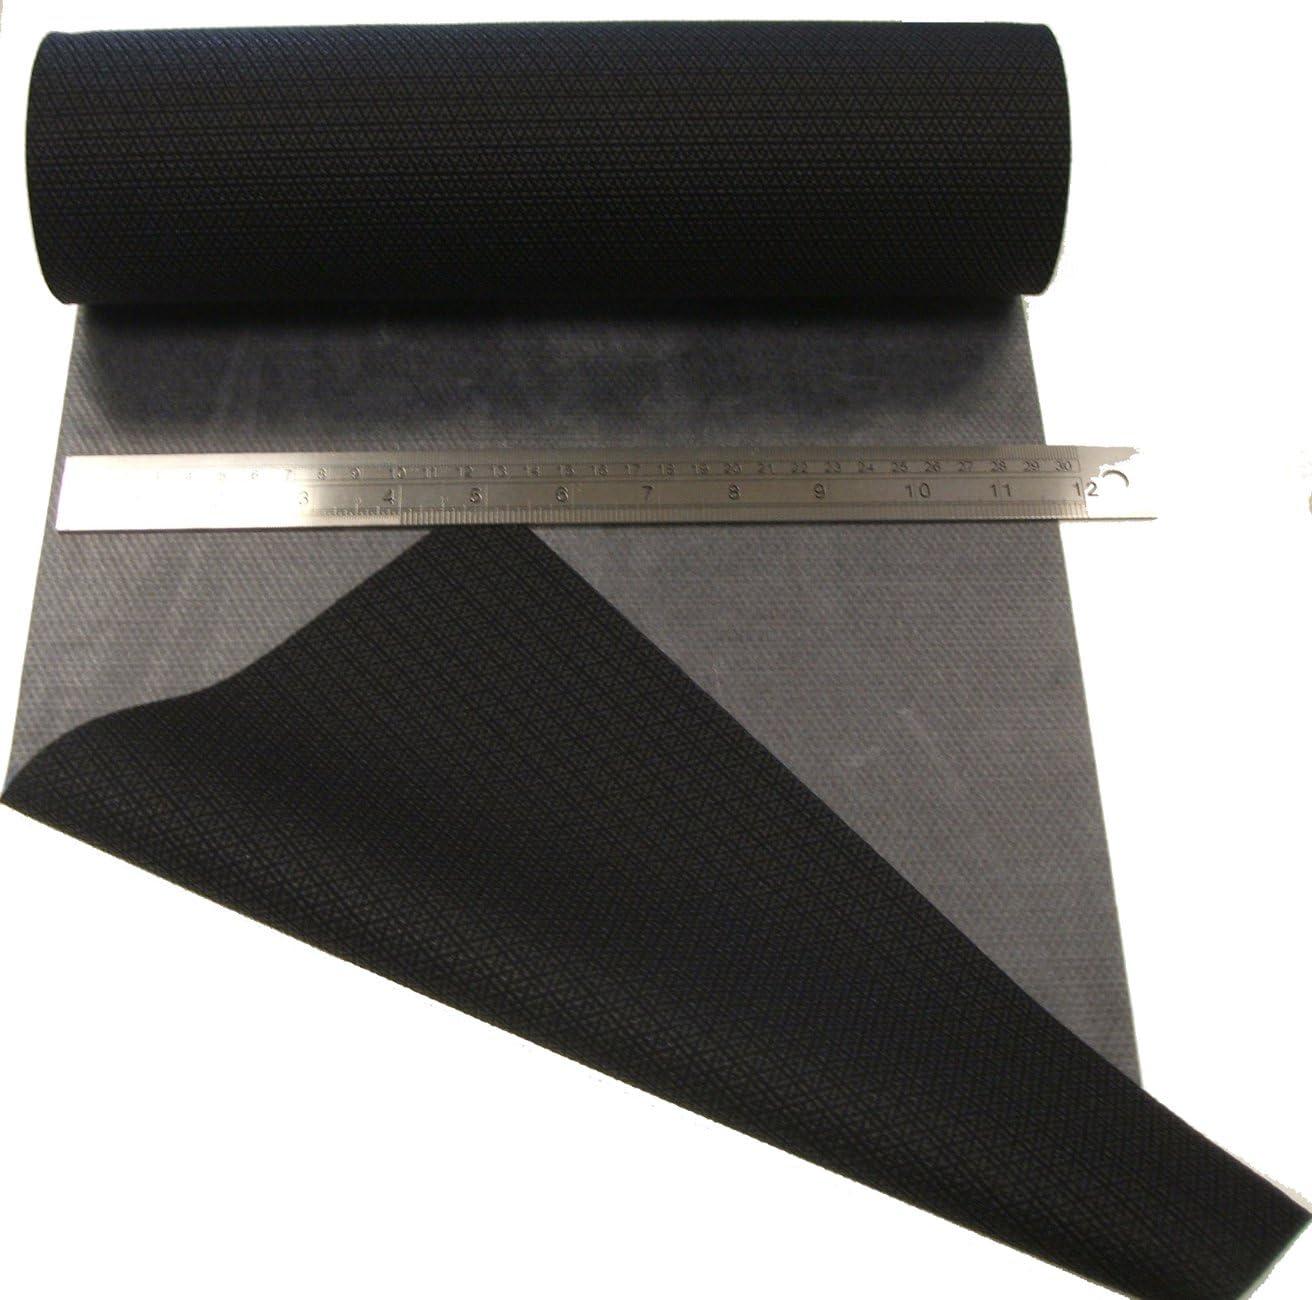 WBM Seam Tapes 0,5 Metros Repare Patch Material de Melco T-5500 -Traje isotérmico/Traje seco, Scuba - Adhesivo termofusible, aplicar con Plancha eléctrico (Negro, 300 mm Ancho)